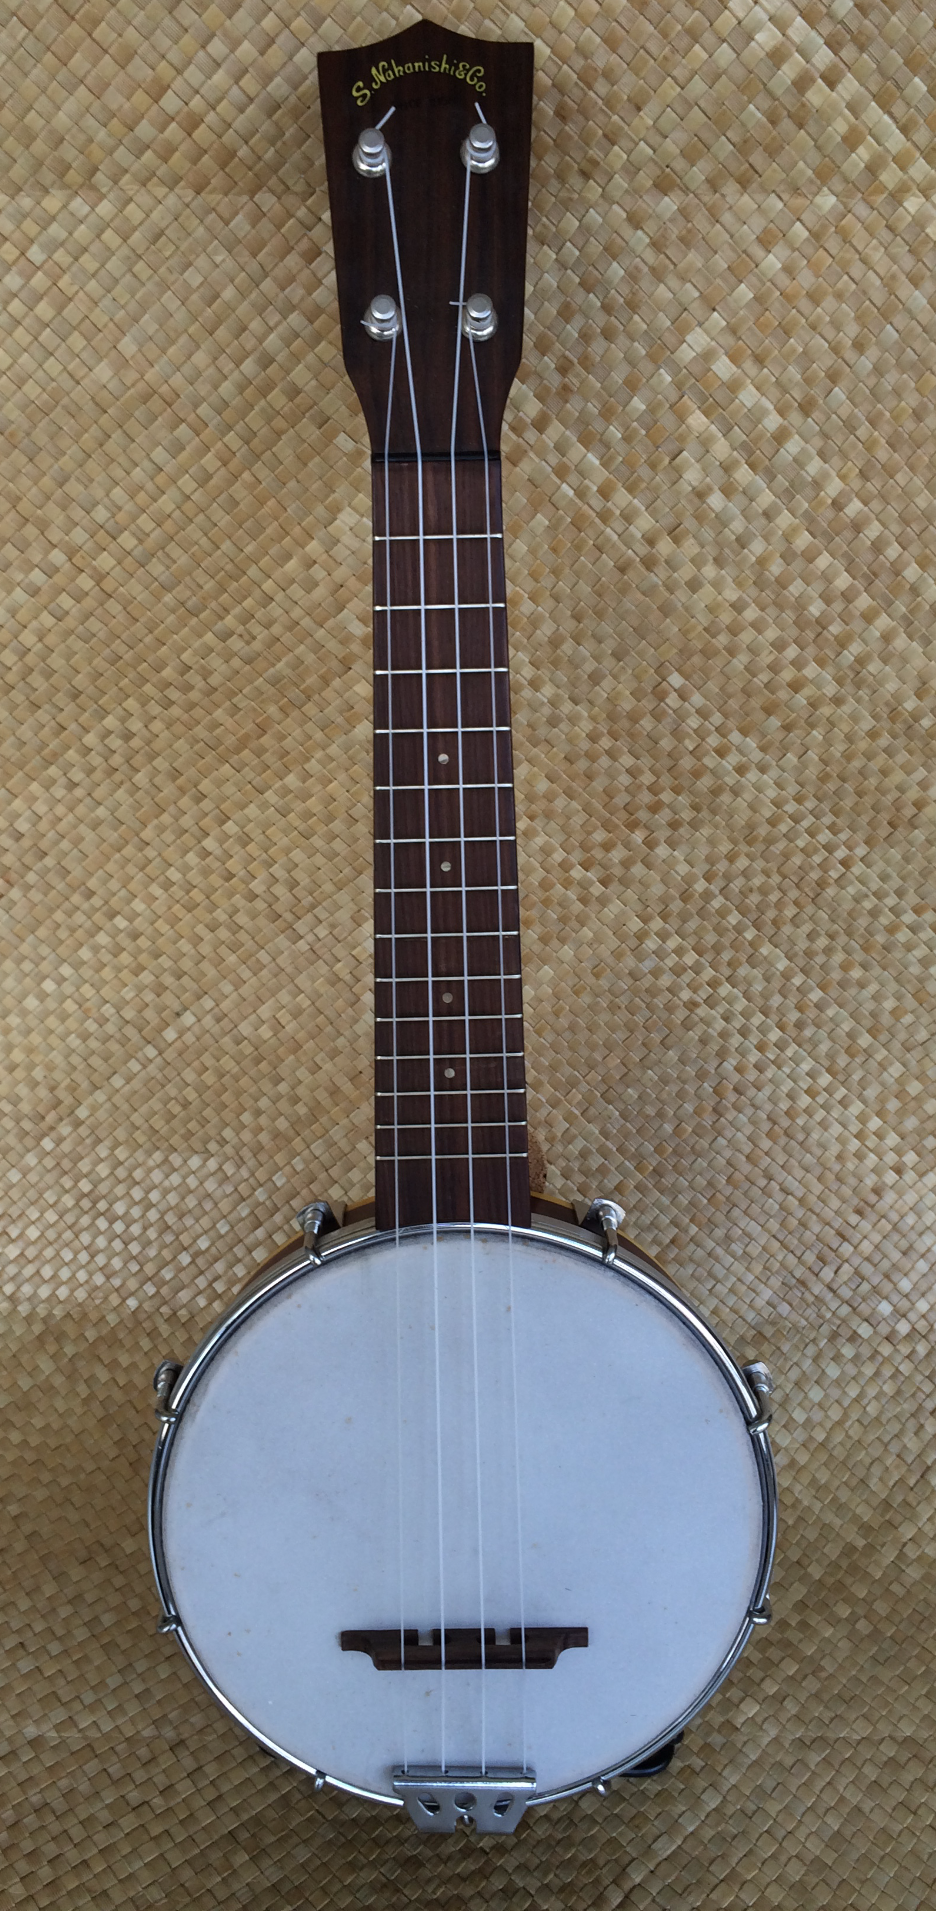 Nakanishi Banjo